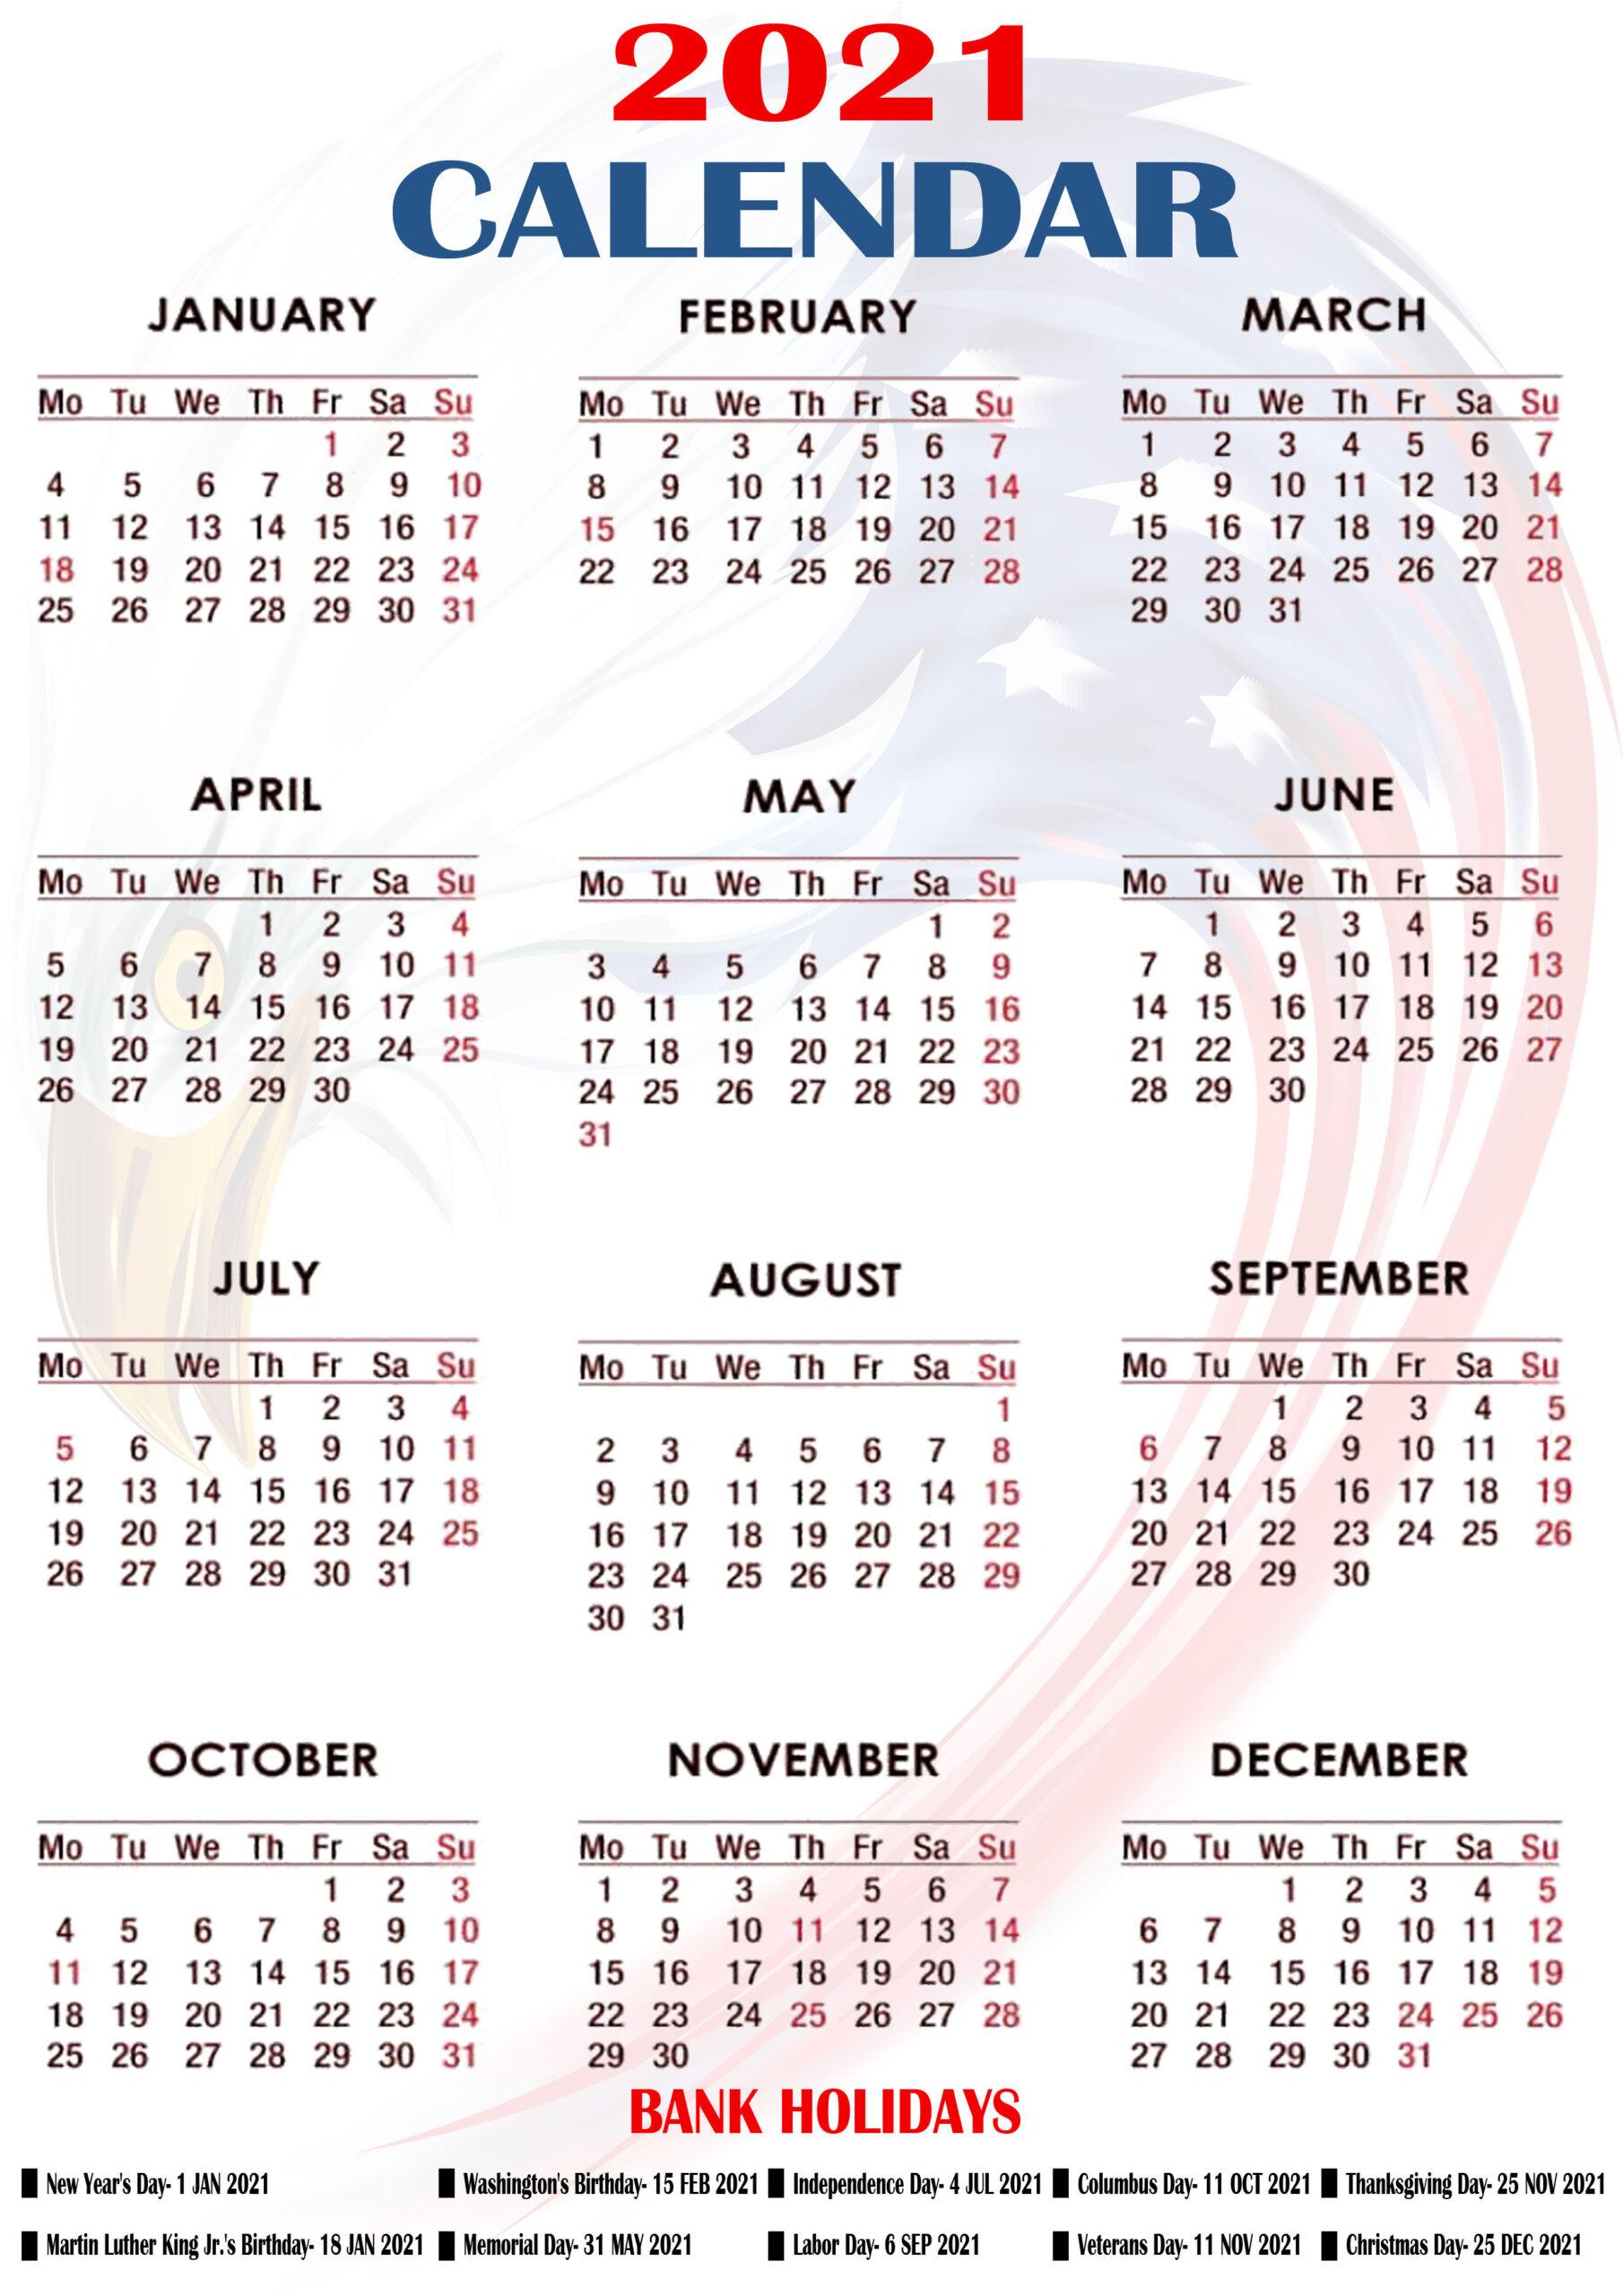 Printable 2021 Us Calendar With Holidays, Federal, Bank-Printable Calendar 2021 With Major Holidays